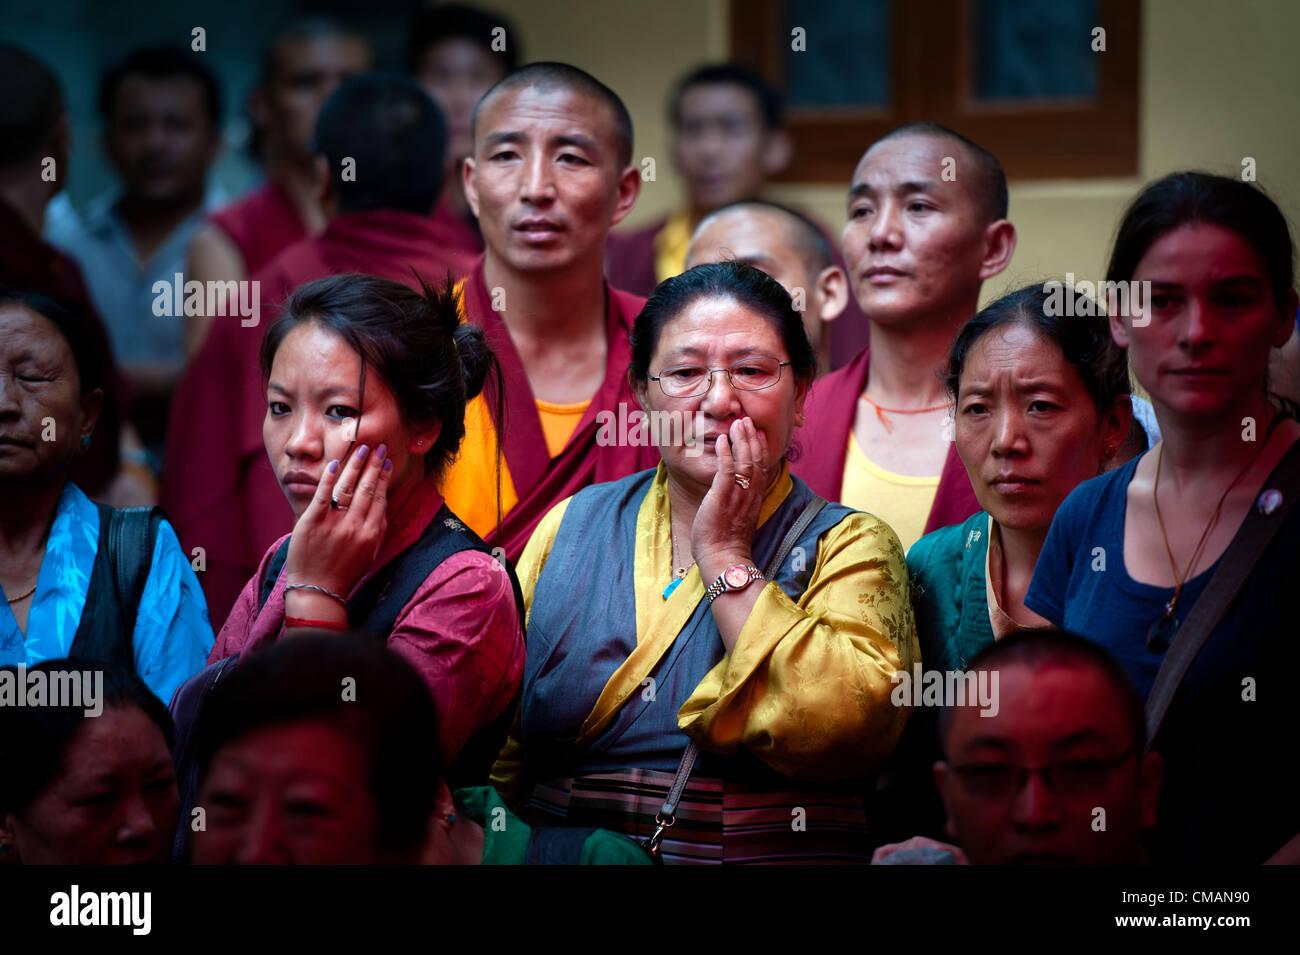 July 6, 2012 - Kathmandu, Kathmandu, Nepal - Tibetan refugees gather to celebrate Dalai Lama's birthday on the grounds Stock Photo